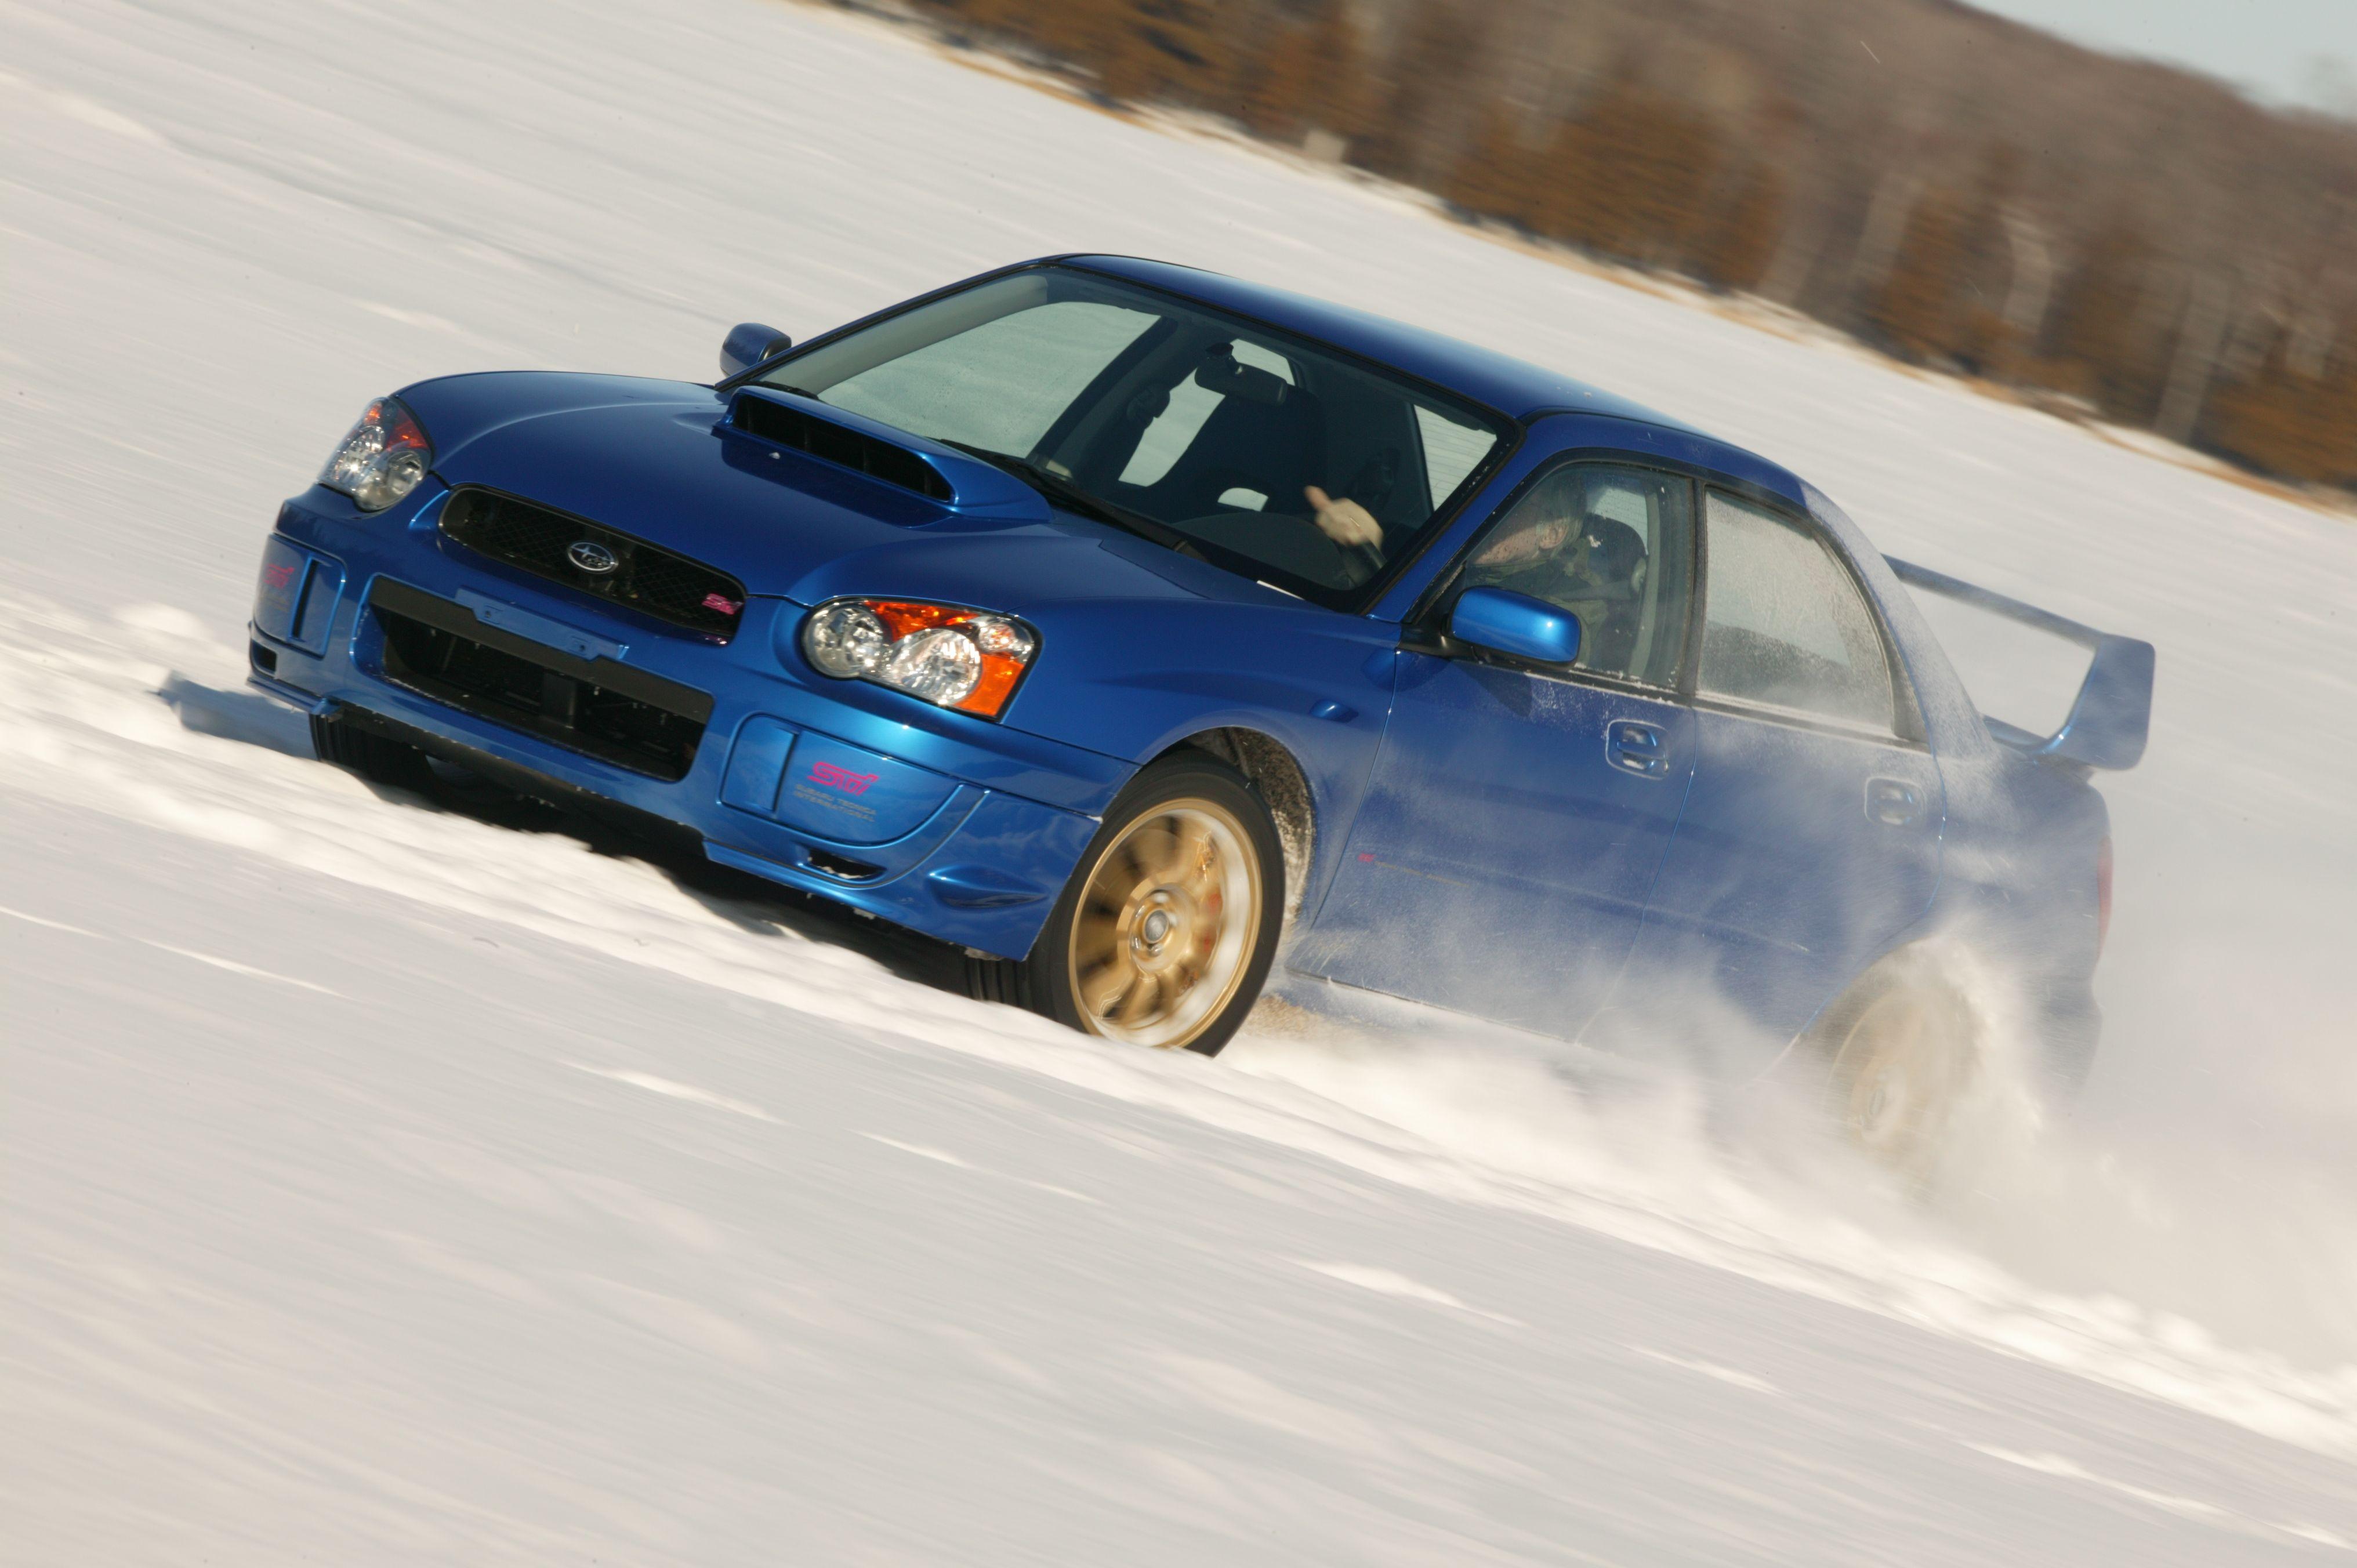 Subaru Impreza Wrx Sti 2004 2007 Review Buyers Guide 2006 Fuel Filter Location